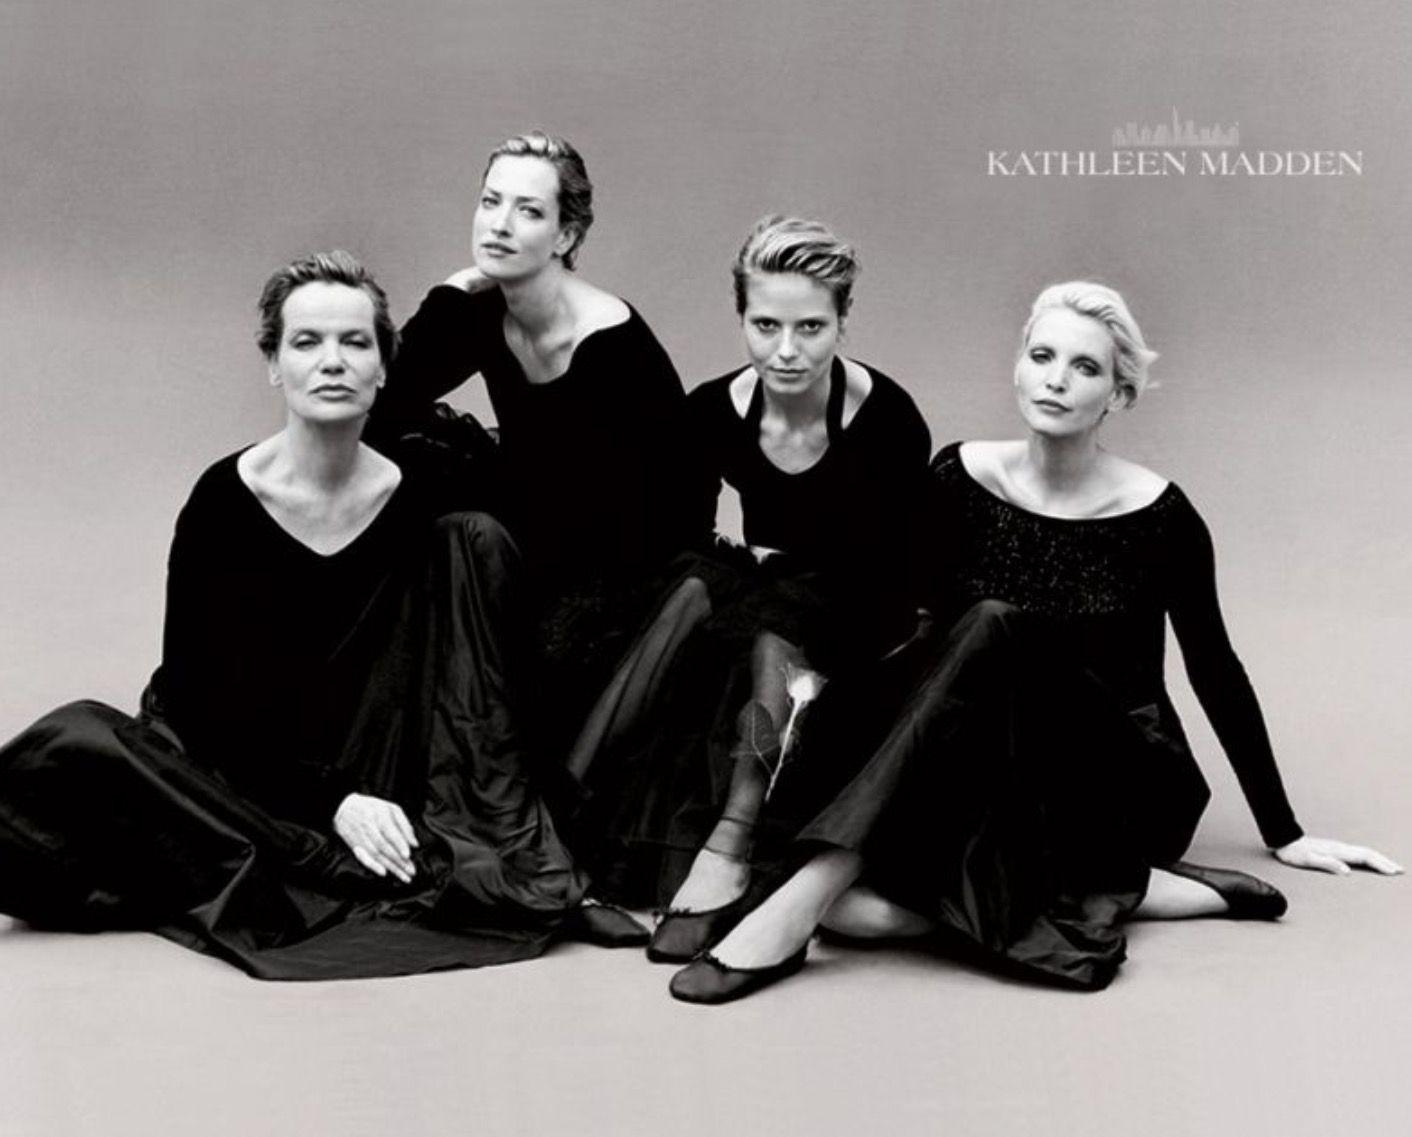 Veruschka, Tatjana, Heidi and Nadja by Peter Lindbergh - Kathleen Madden